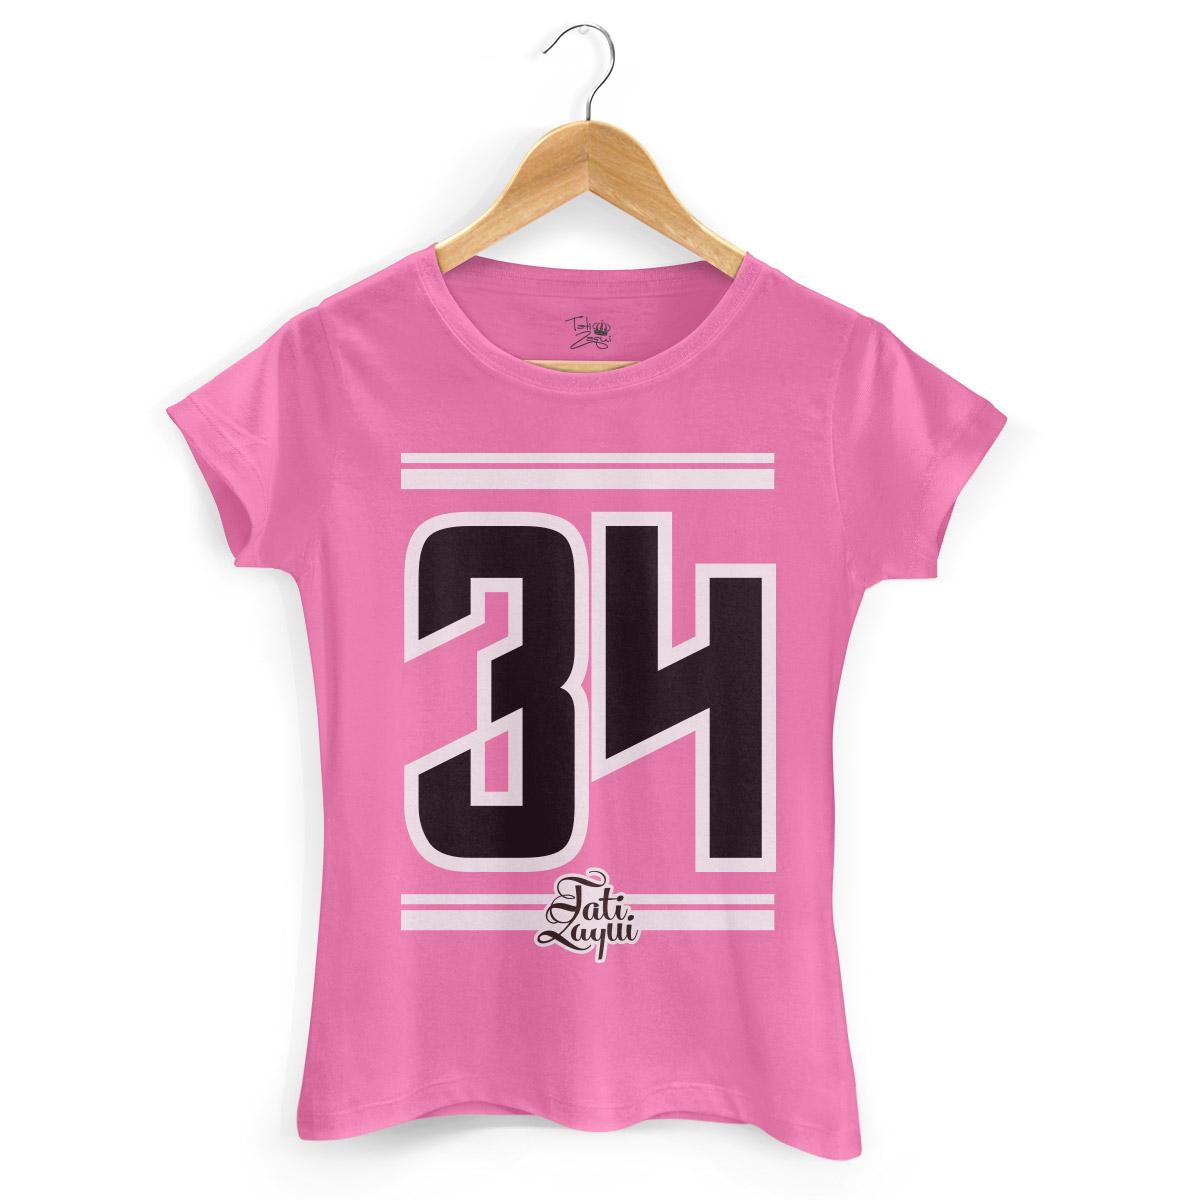 Camiseta Feminina MC Tati Zaqui 34